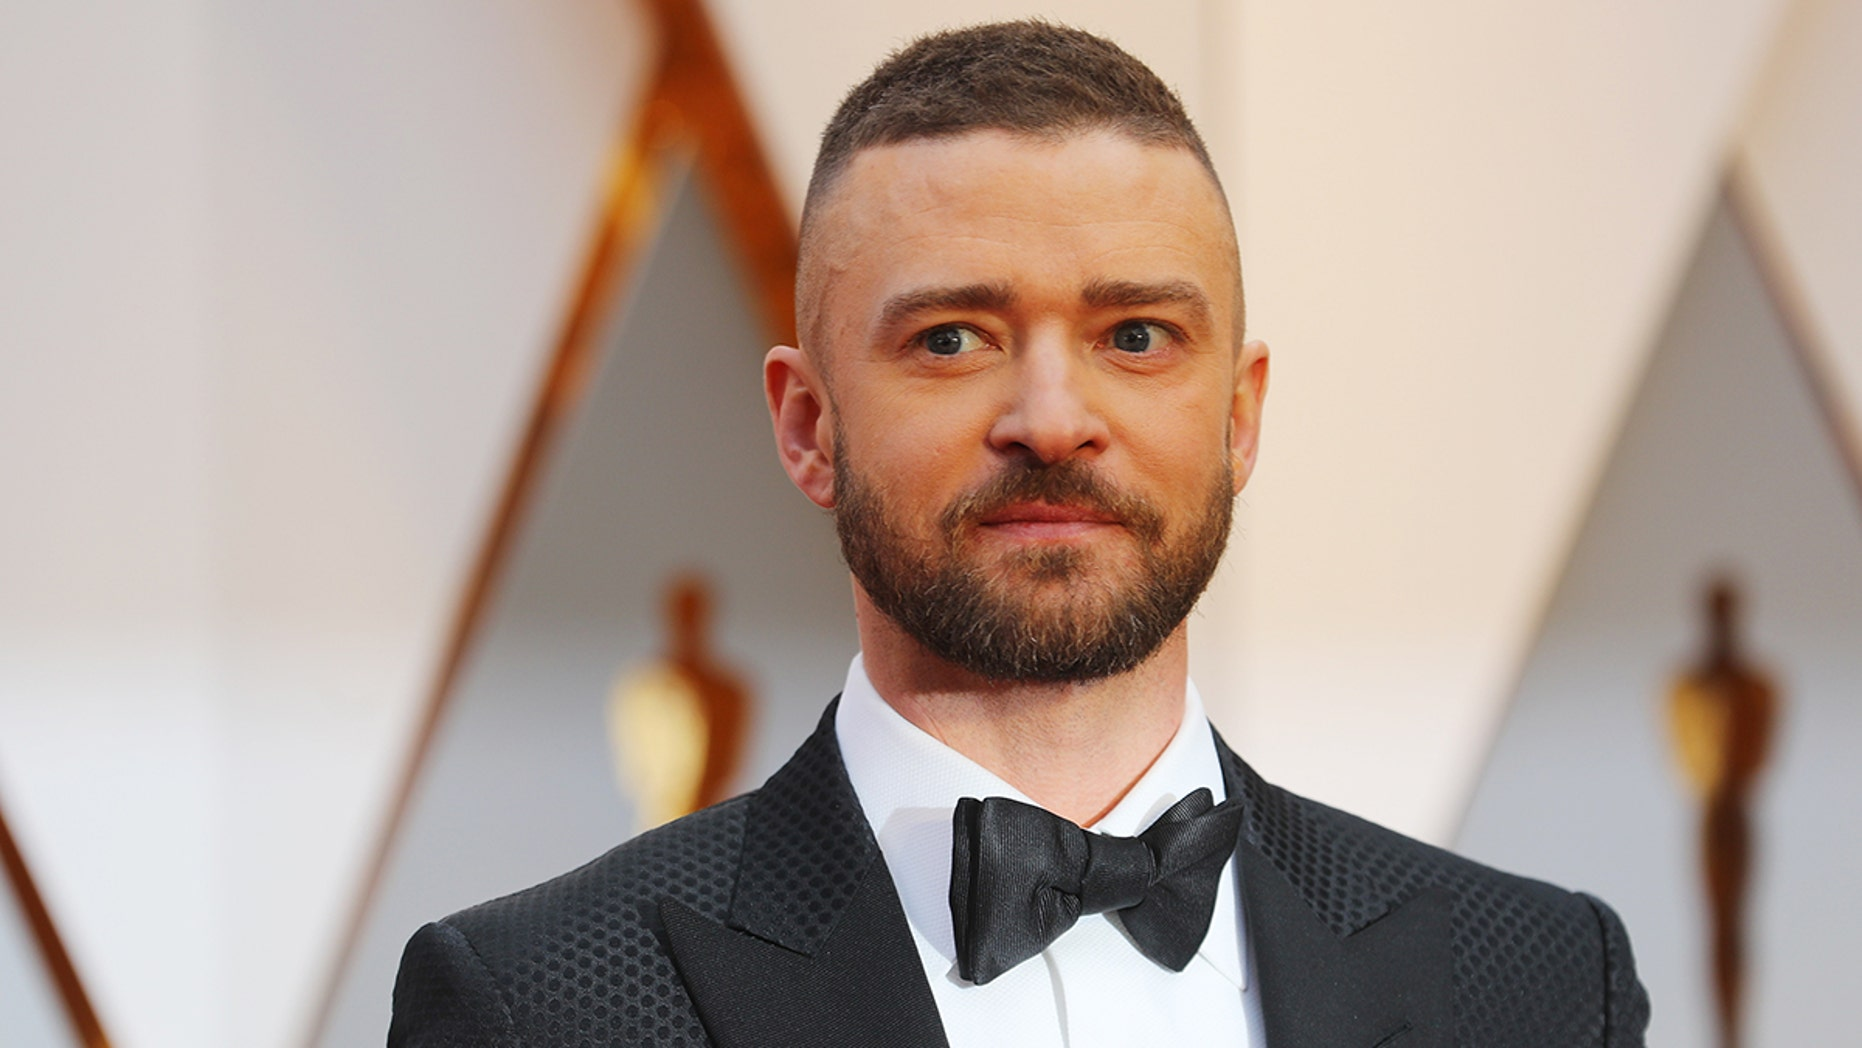 89th Academy Awards - Oscars Red Carpet Arrivals - Hollywood, California, U.S. - 26/02/17 - Singer Justin Timberlake. REUTERS/Mike Blake - HP1ED2R03000B